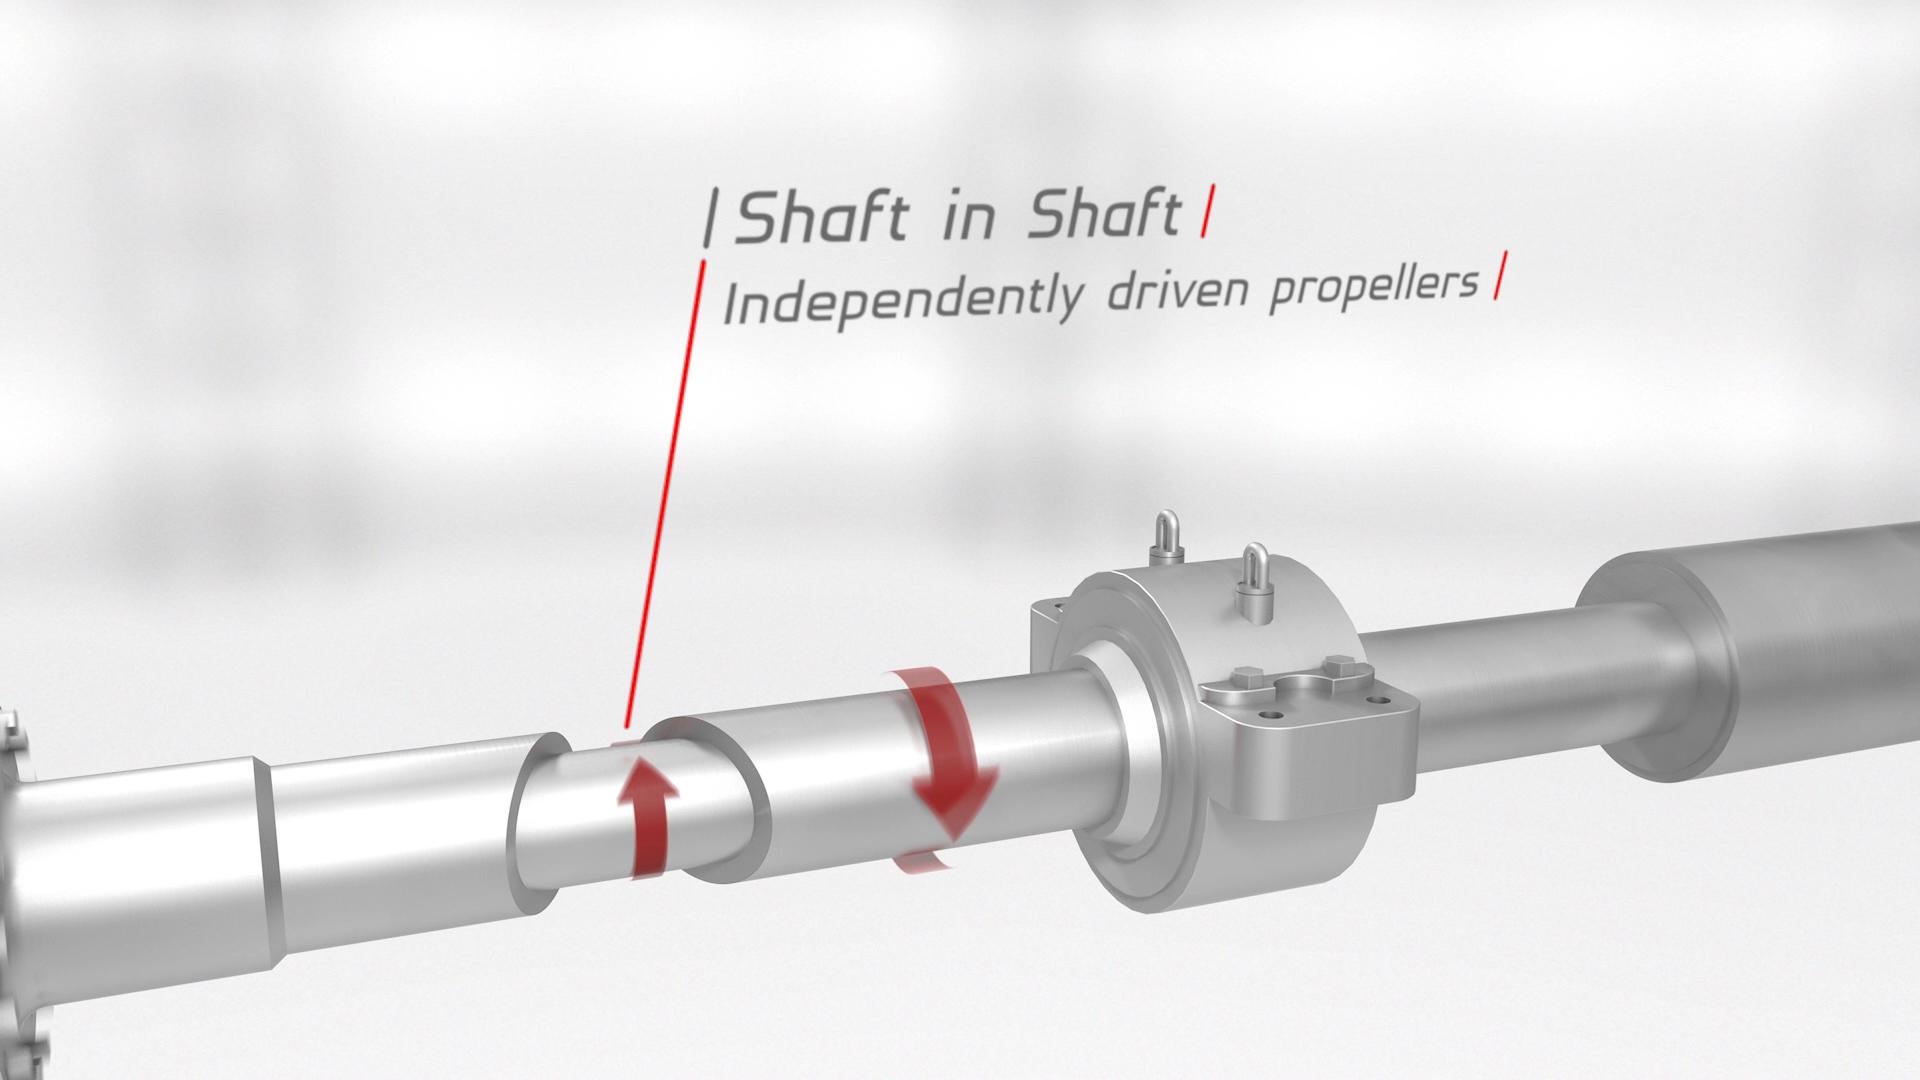 Brunvoll CRP Contra Rotating Propeller Shaft in Shaft arrangement